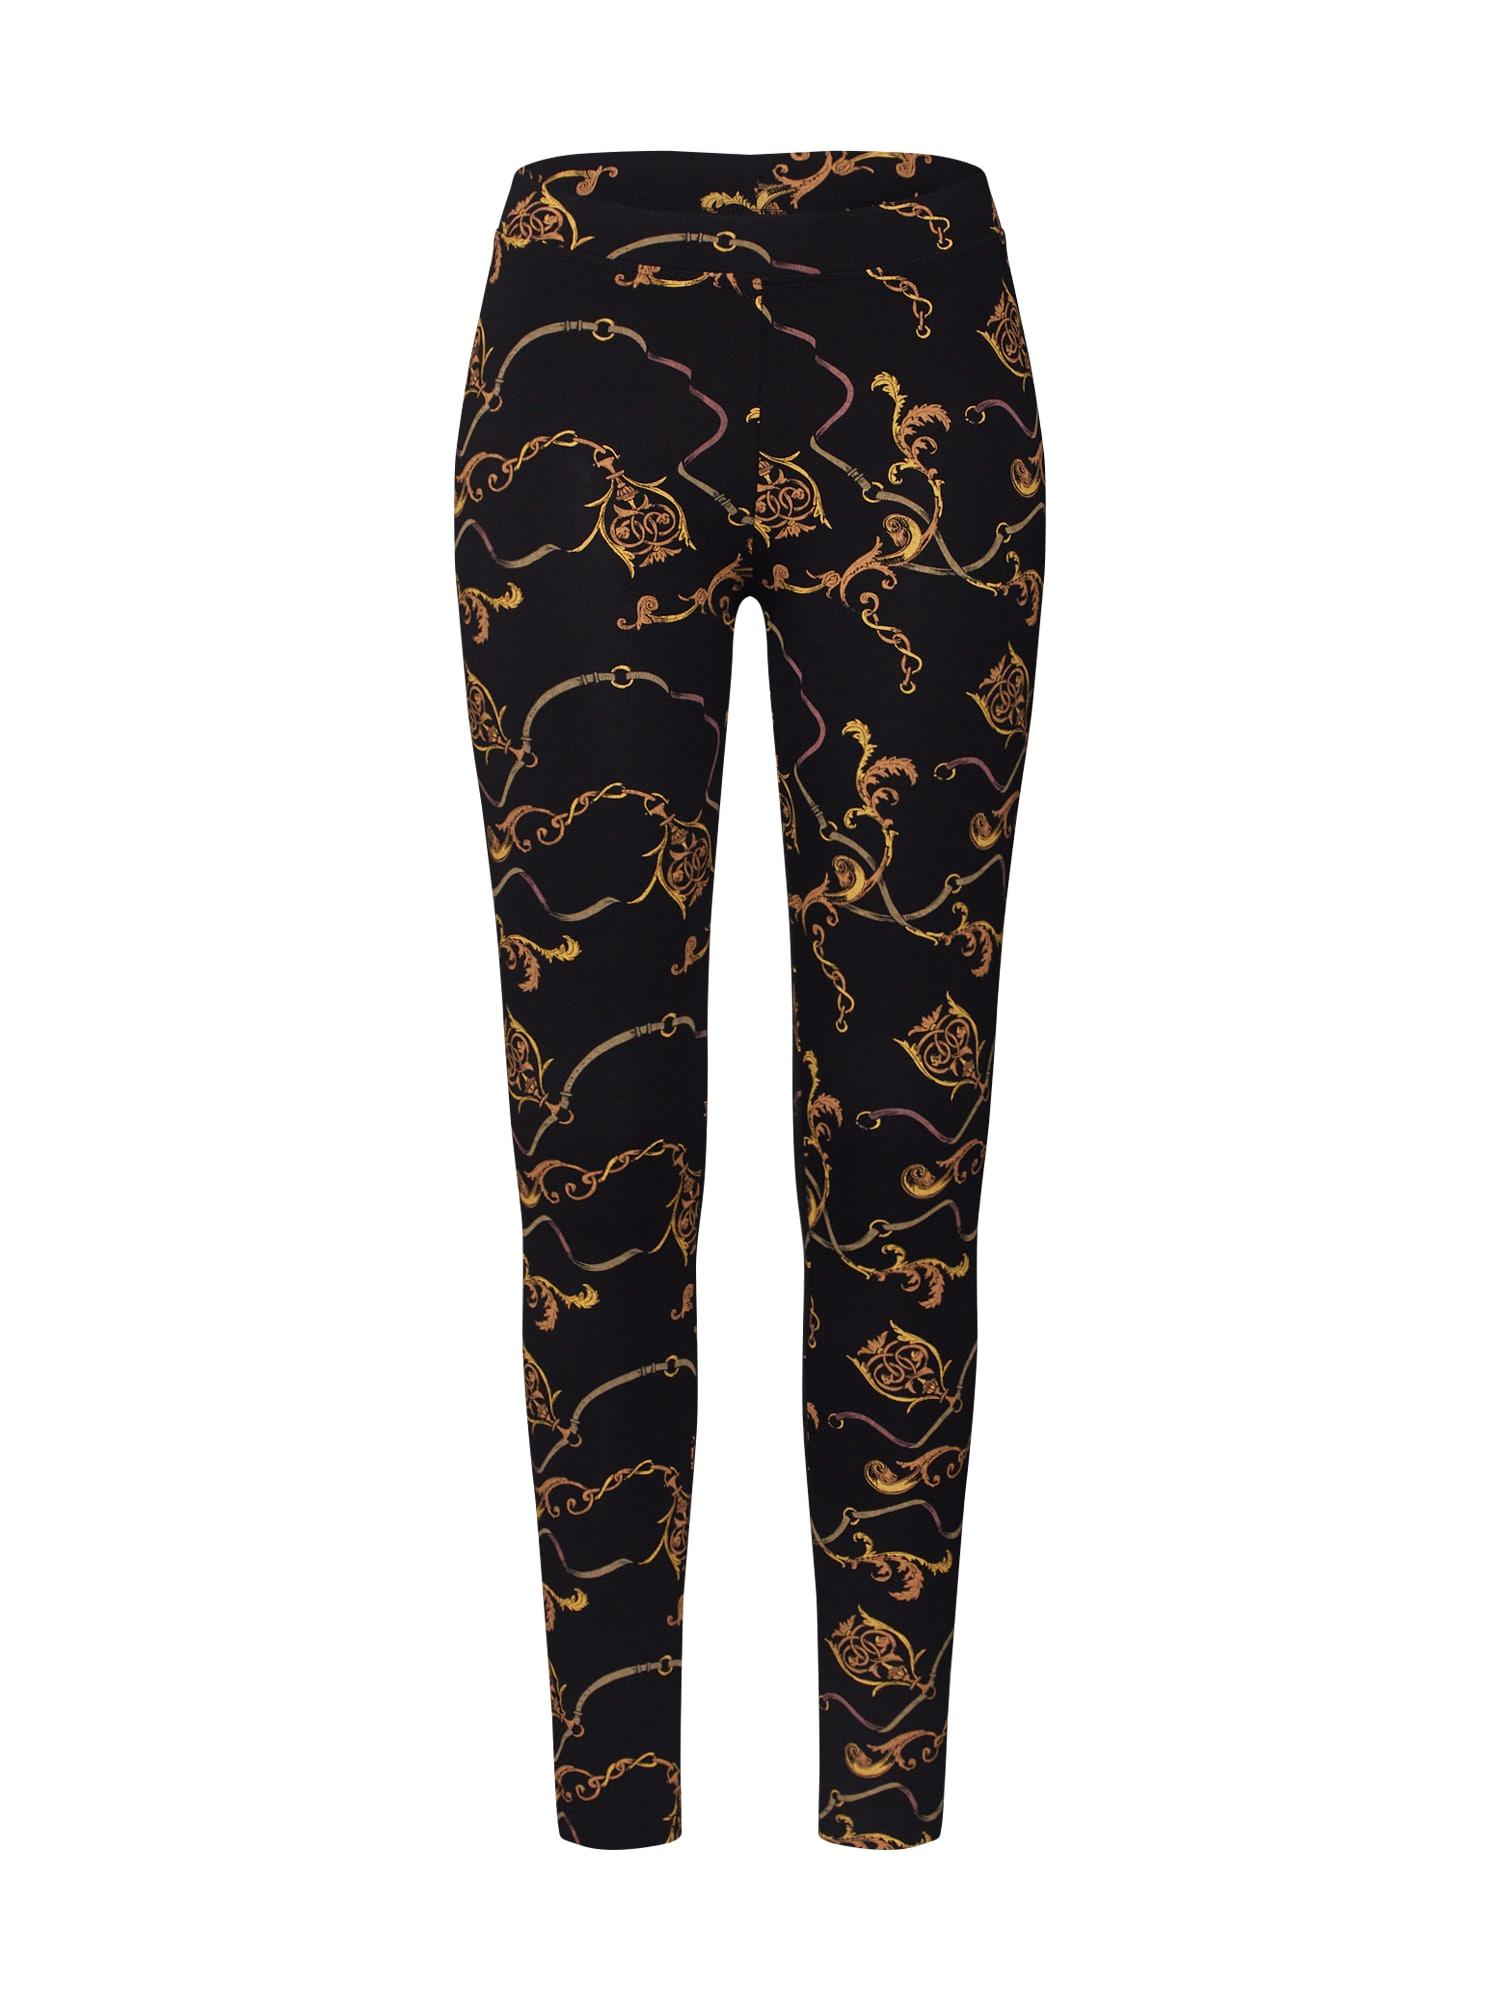 Urban Classics Chino nohavice 'Luxury'  zlatá žltá / čierna